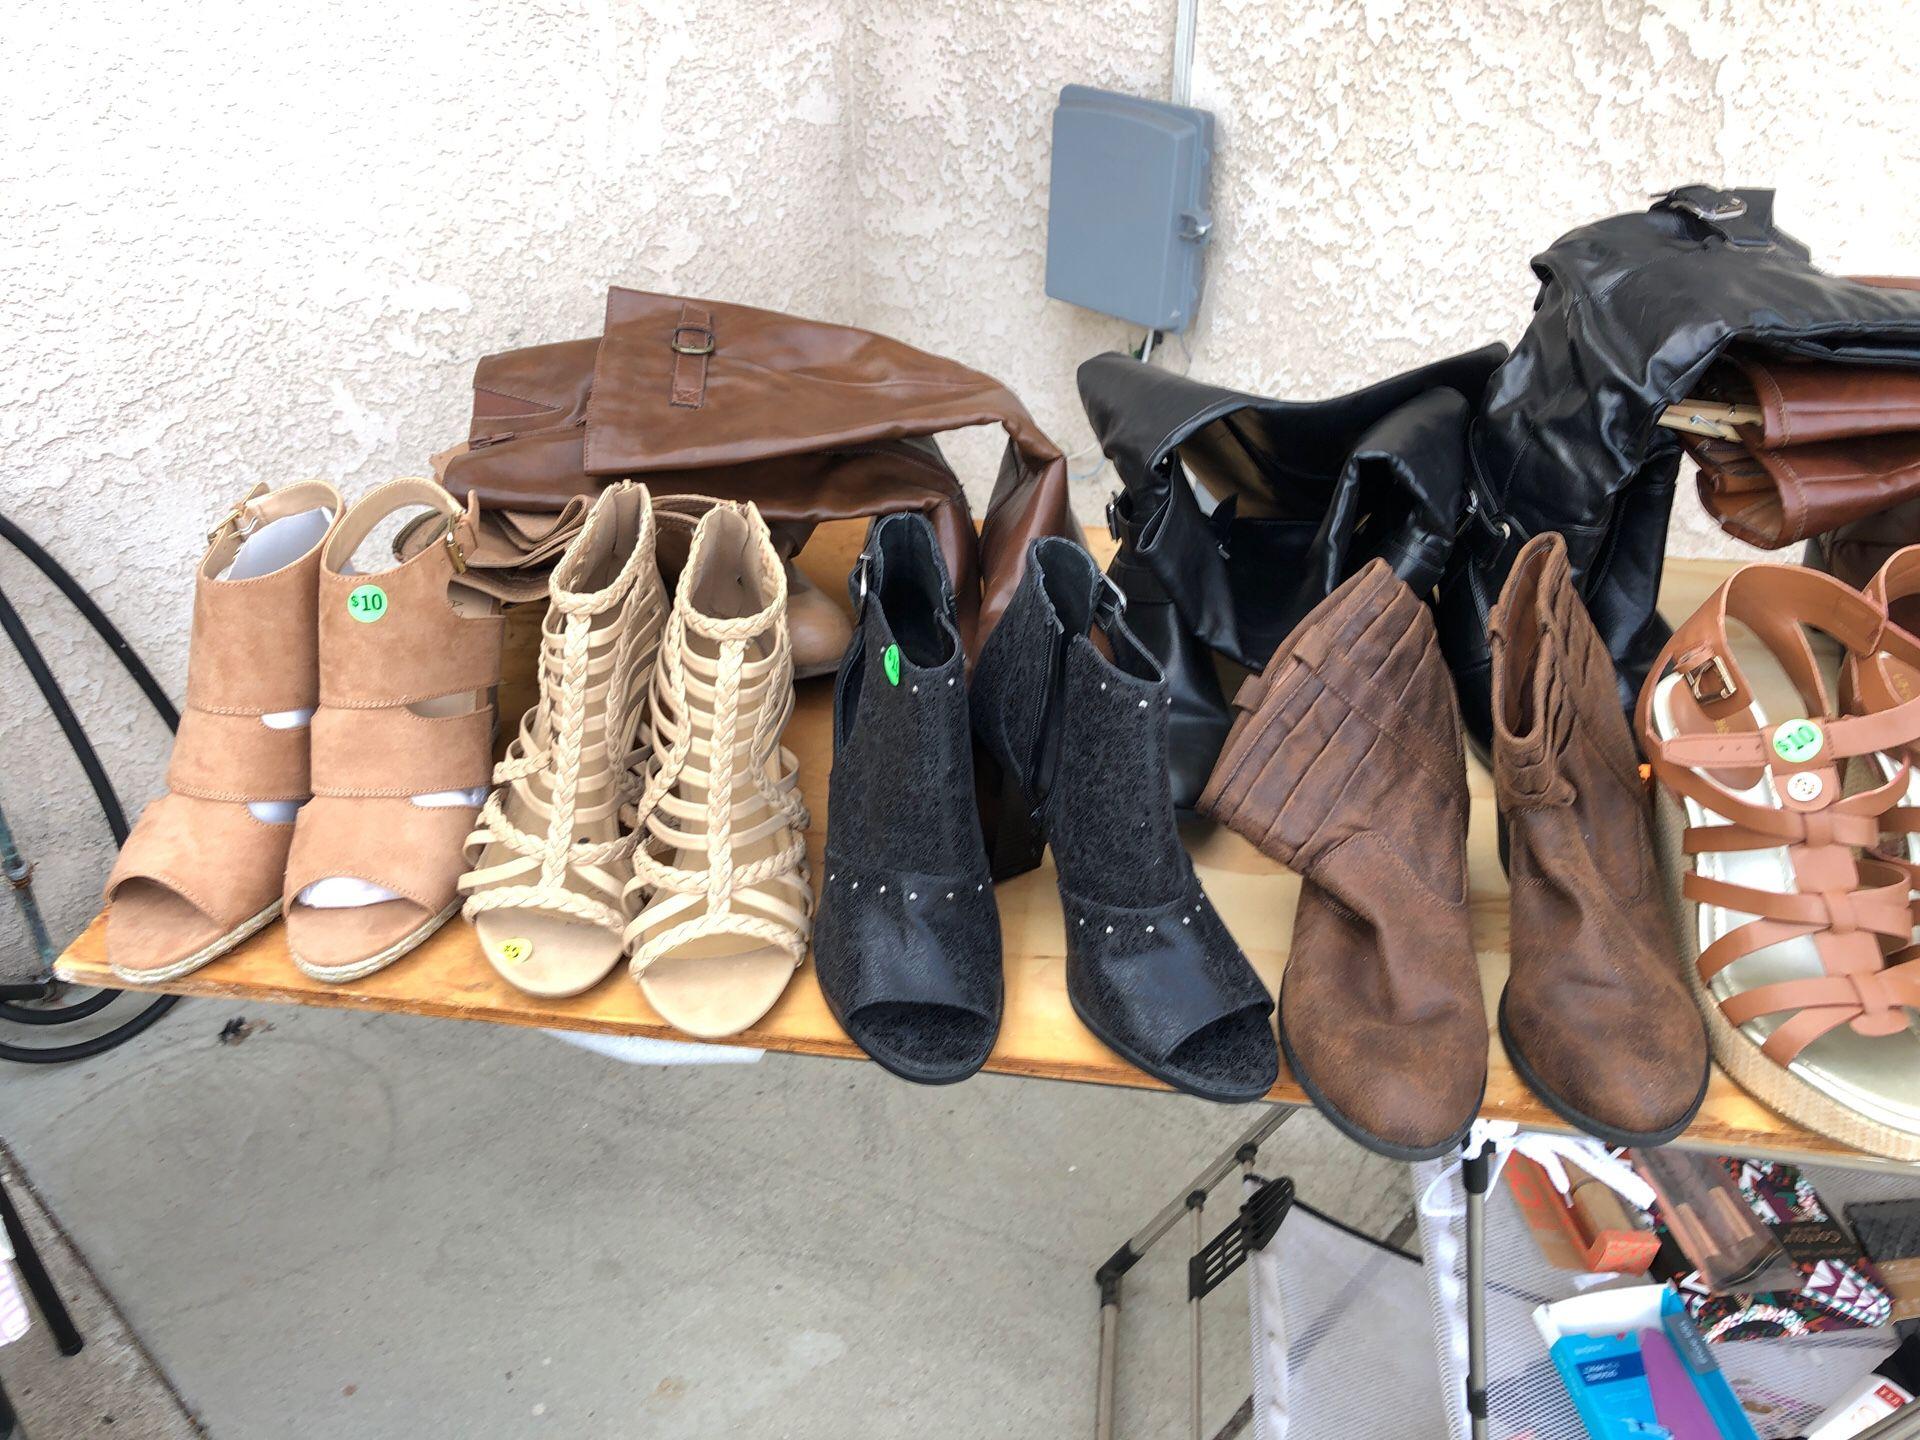 Woman's shoes 9